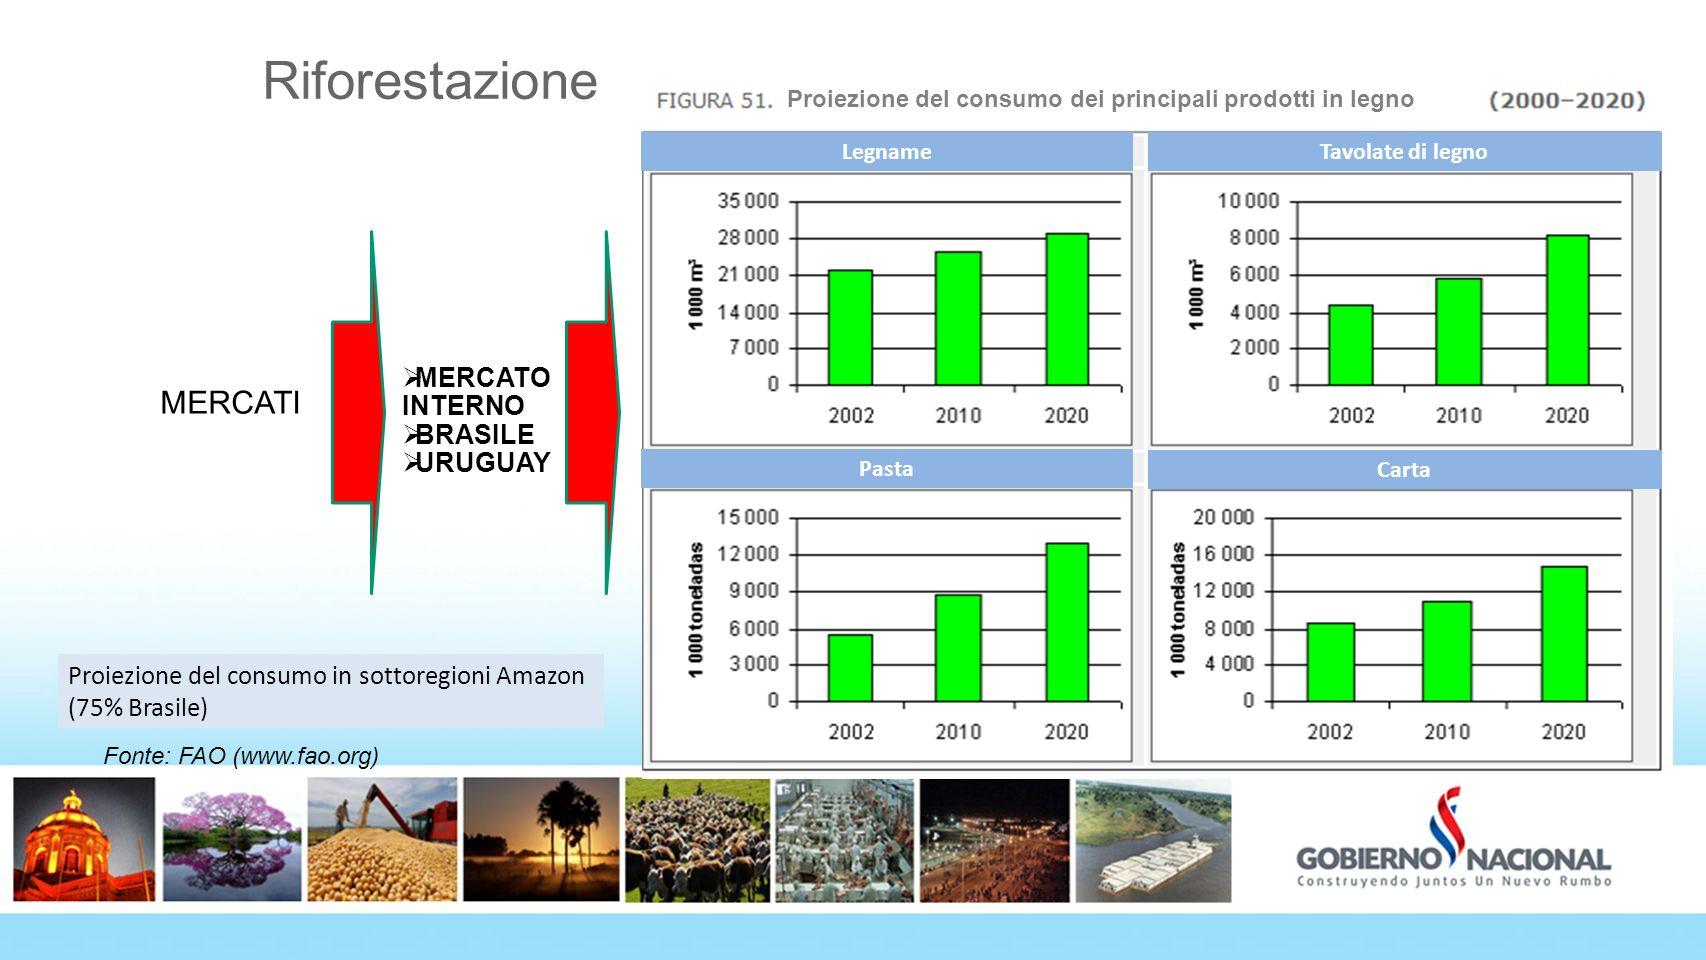 Riforestazione MERCATO INTERNO BRASILE URUGUAY MERCATI Fonte: FAO (www.fao.org) *Proyección de consumo en la Subregión Amazónica (75% Brasil) Proiezio